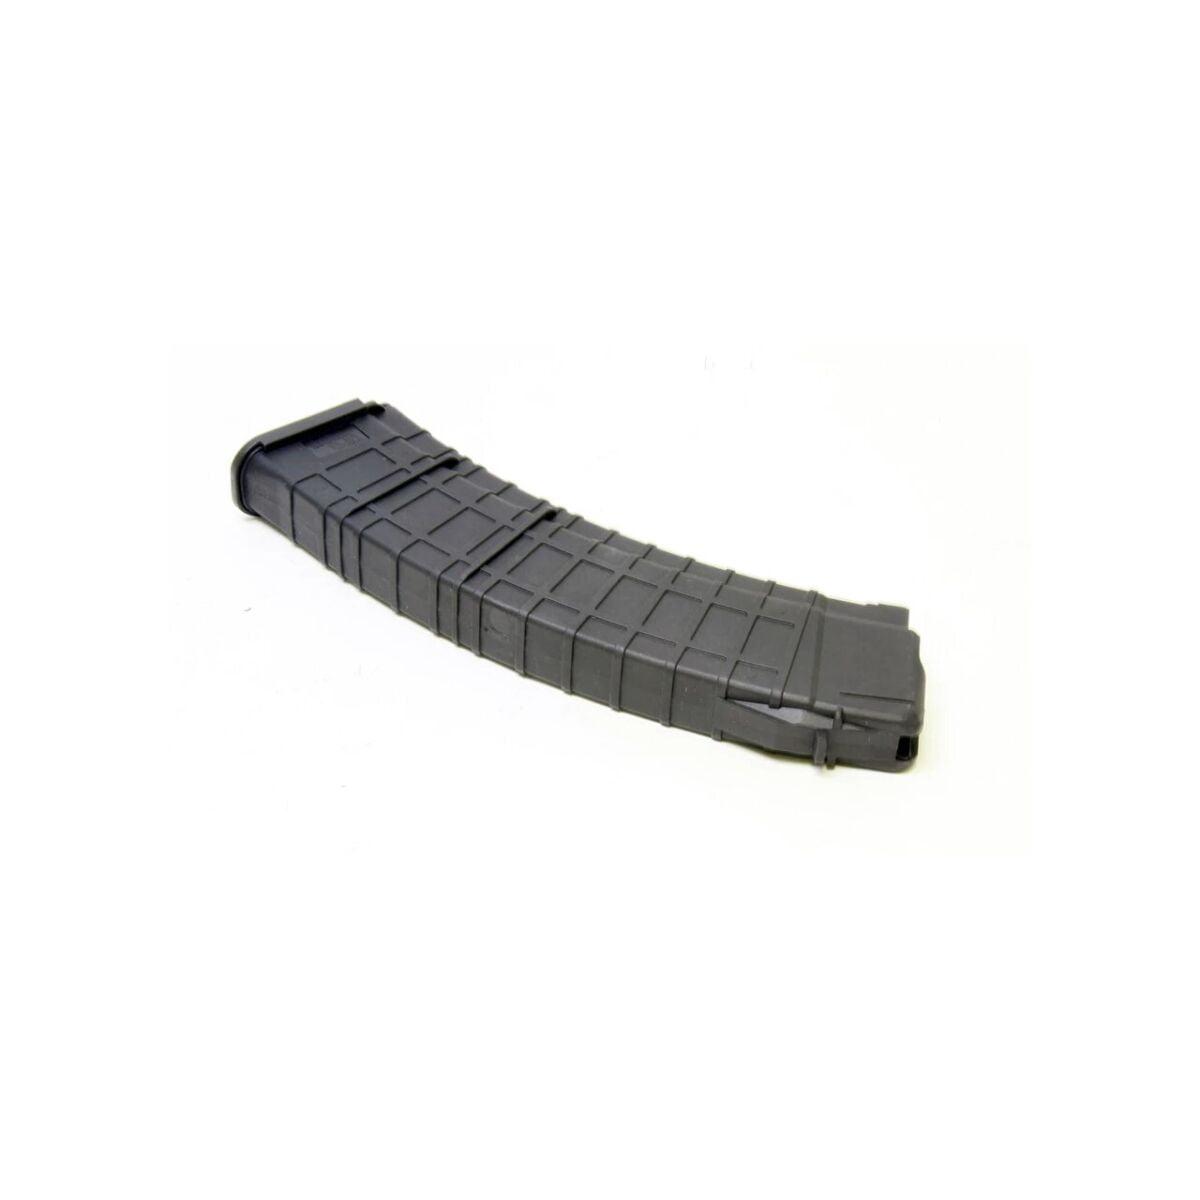 Магазин PROMAG для АК74/АКСУ кал. 5.45х39 на 40 патронов